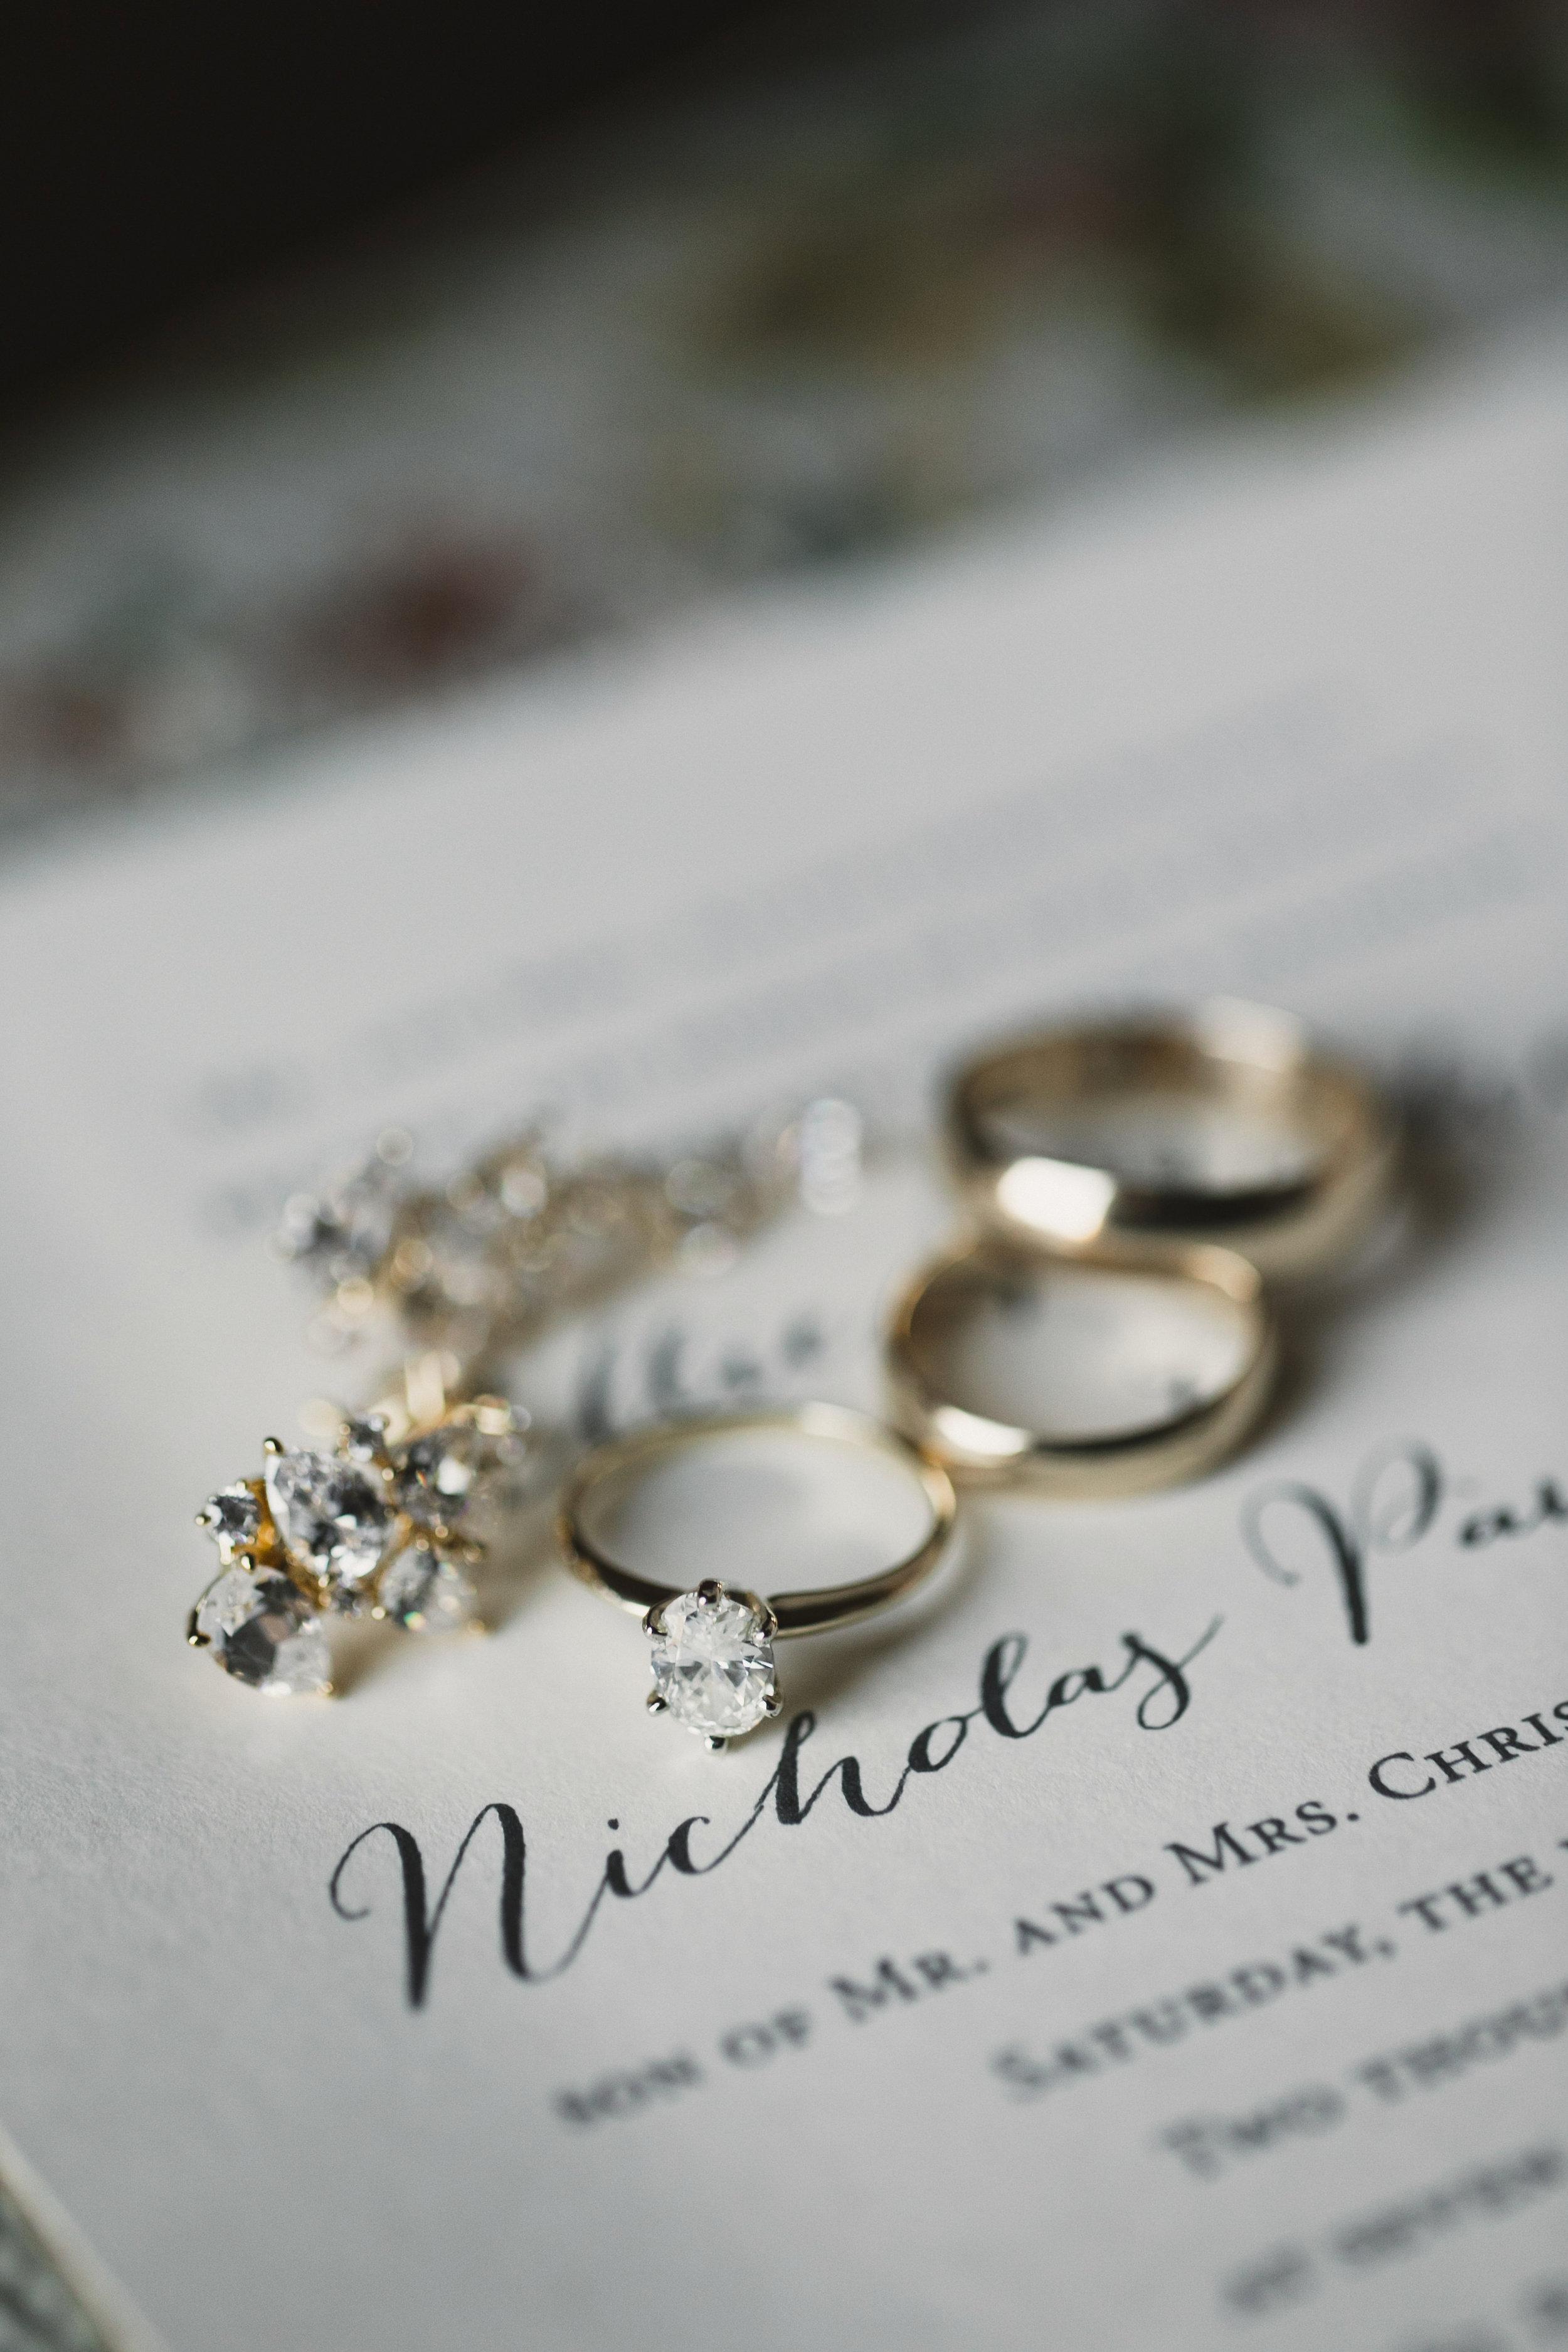 Kenner_Cortese_wedding_0035.jpg